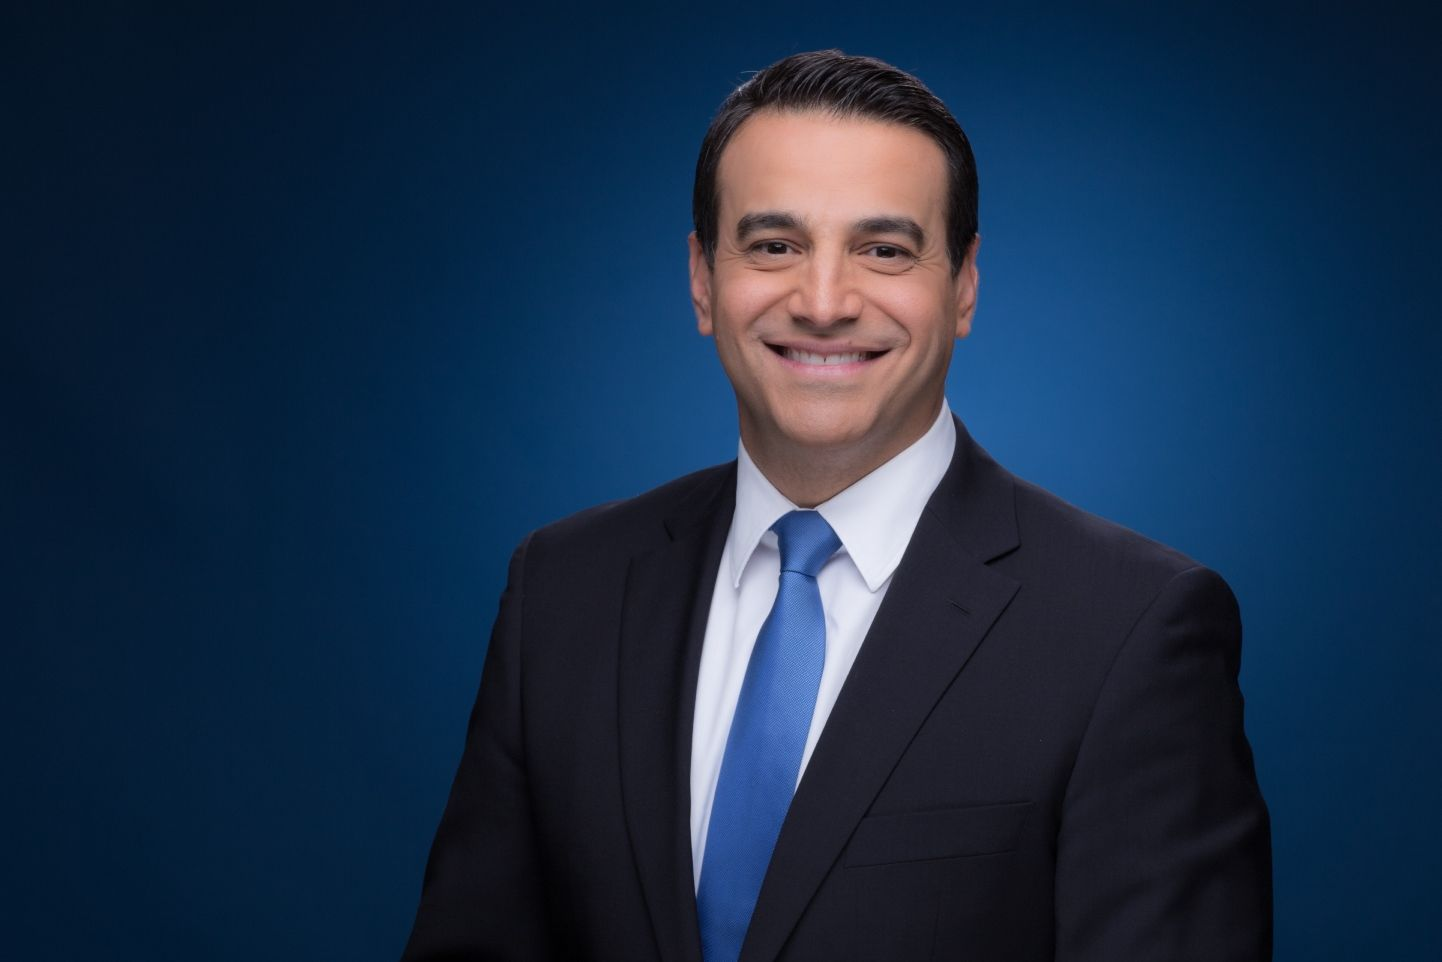 Jalal Chahda | Al-Jazeera Christian Presenter | French Archbishop